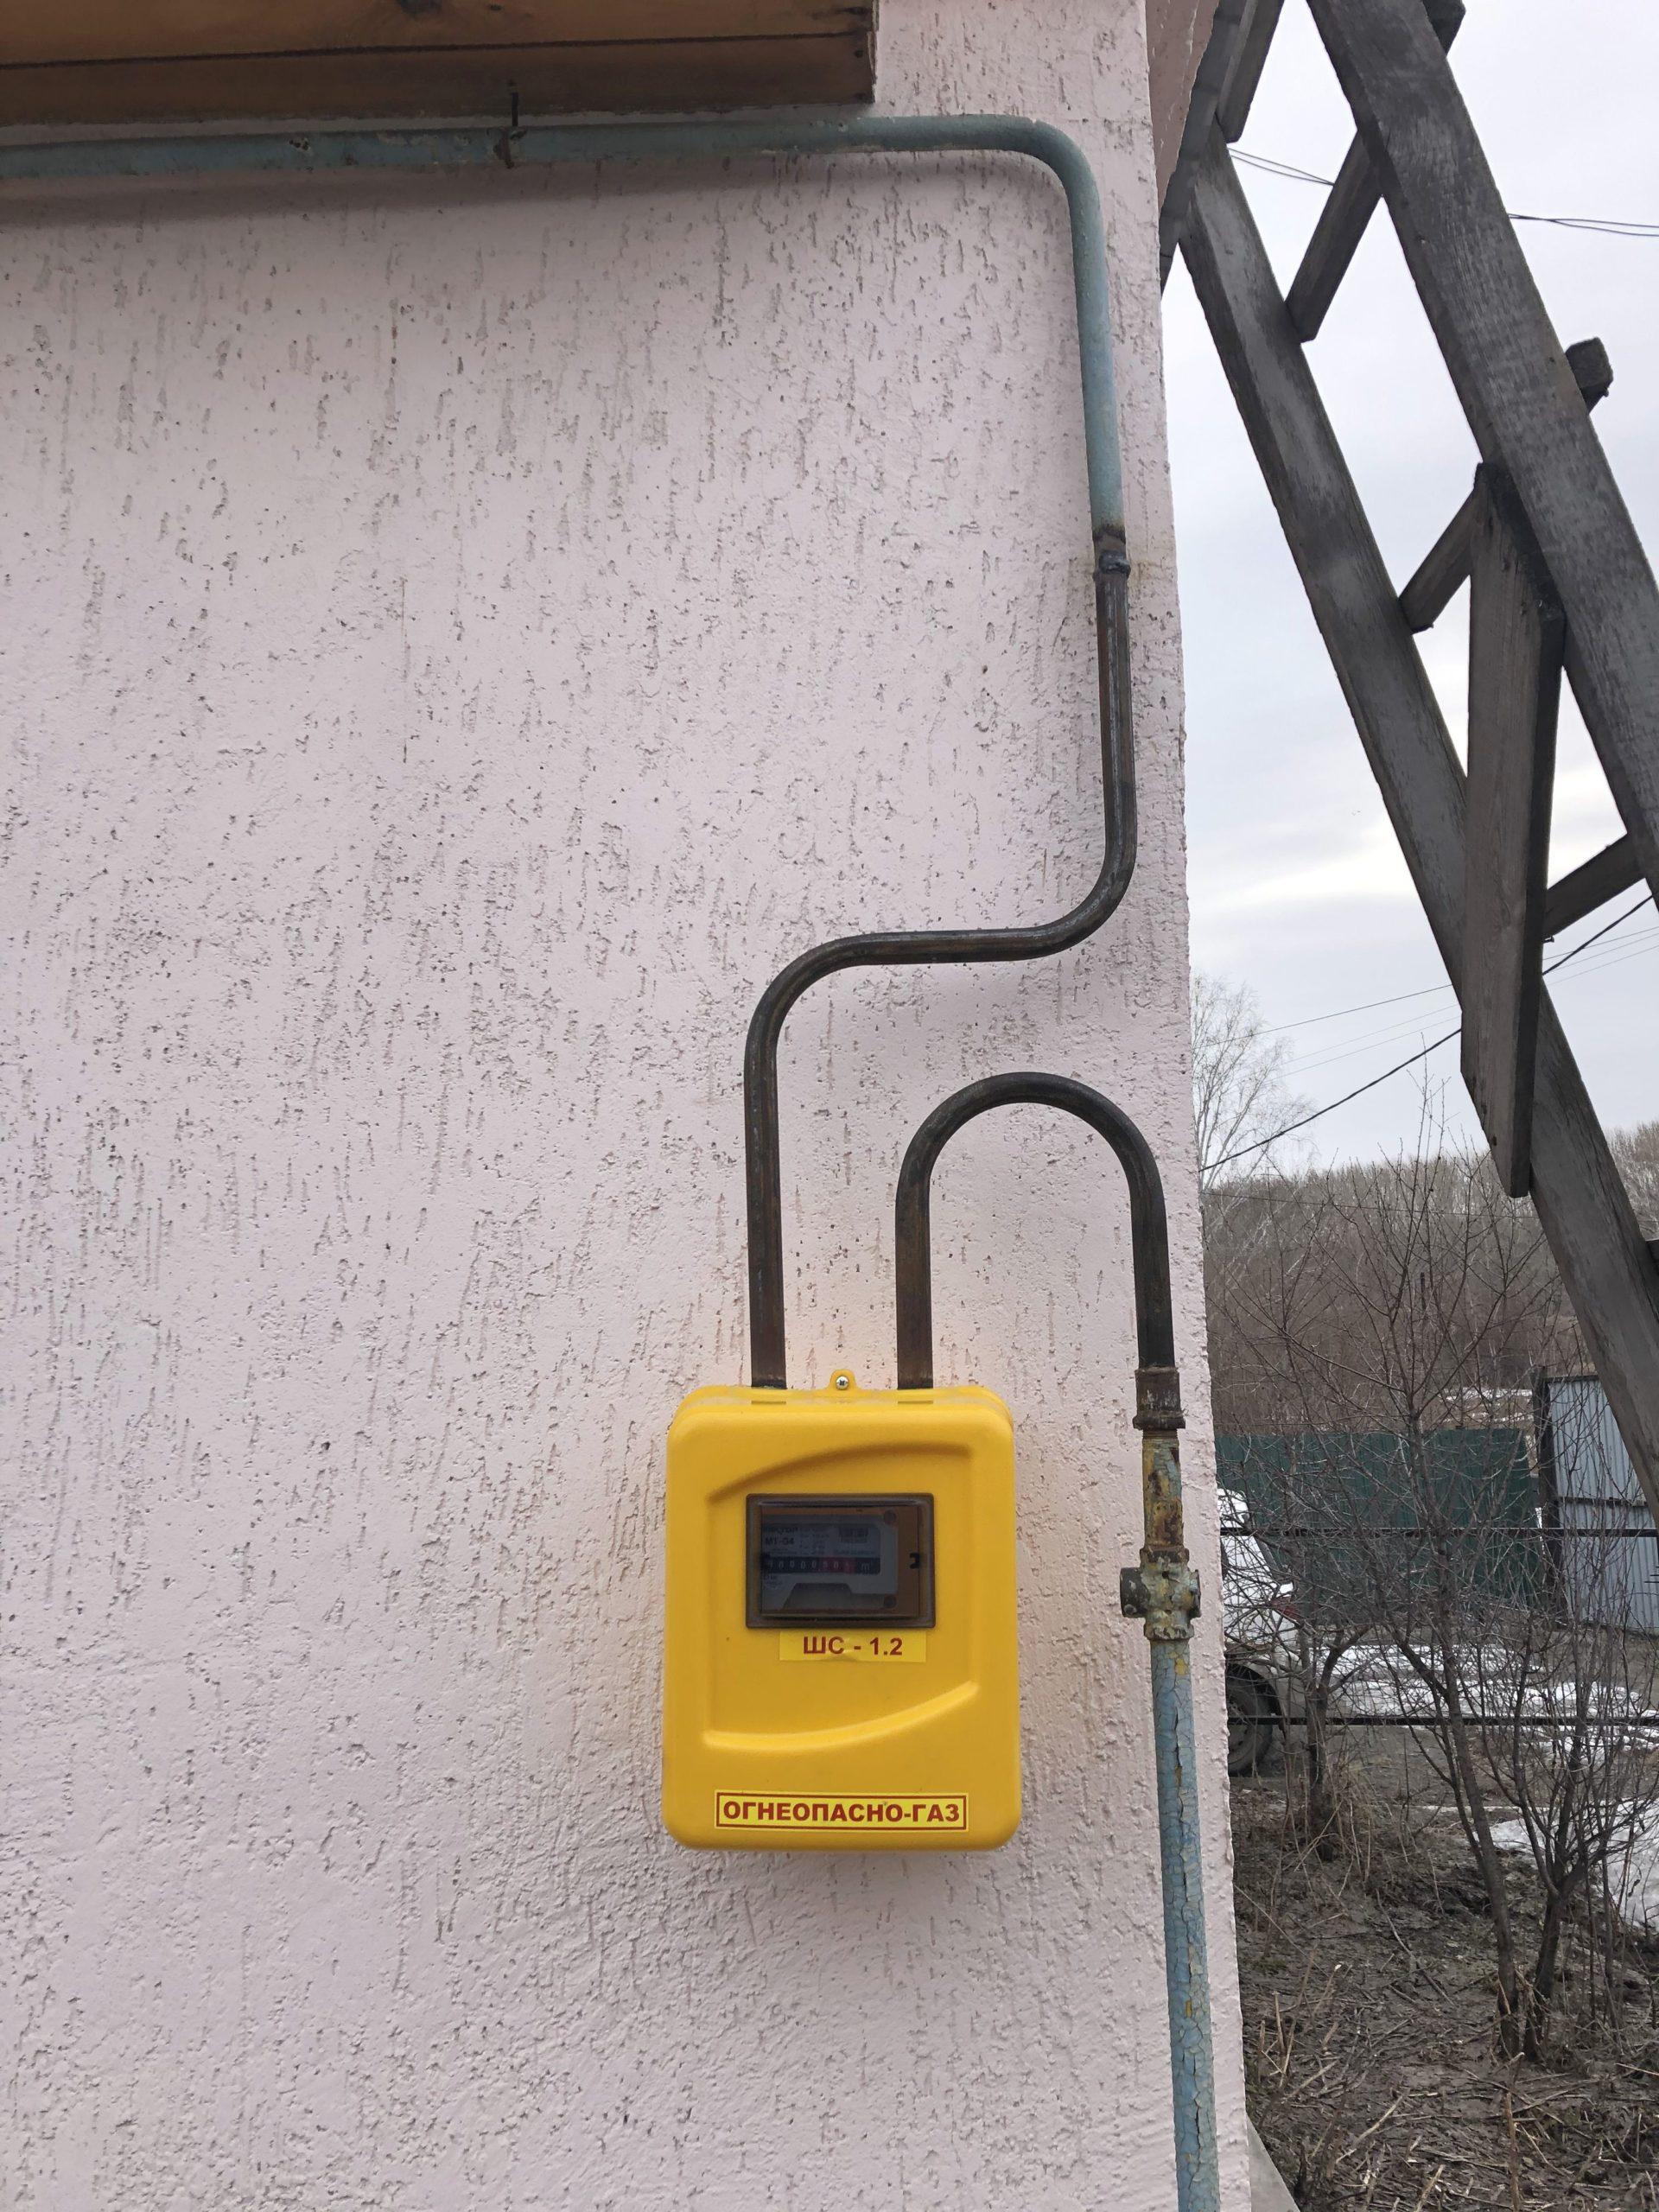 Установка и замена приборов учета газа (счетчиков)